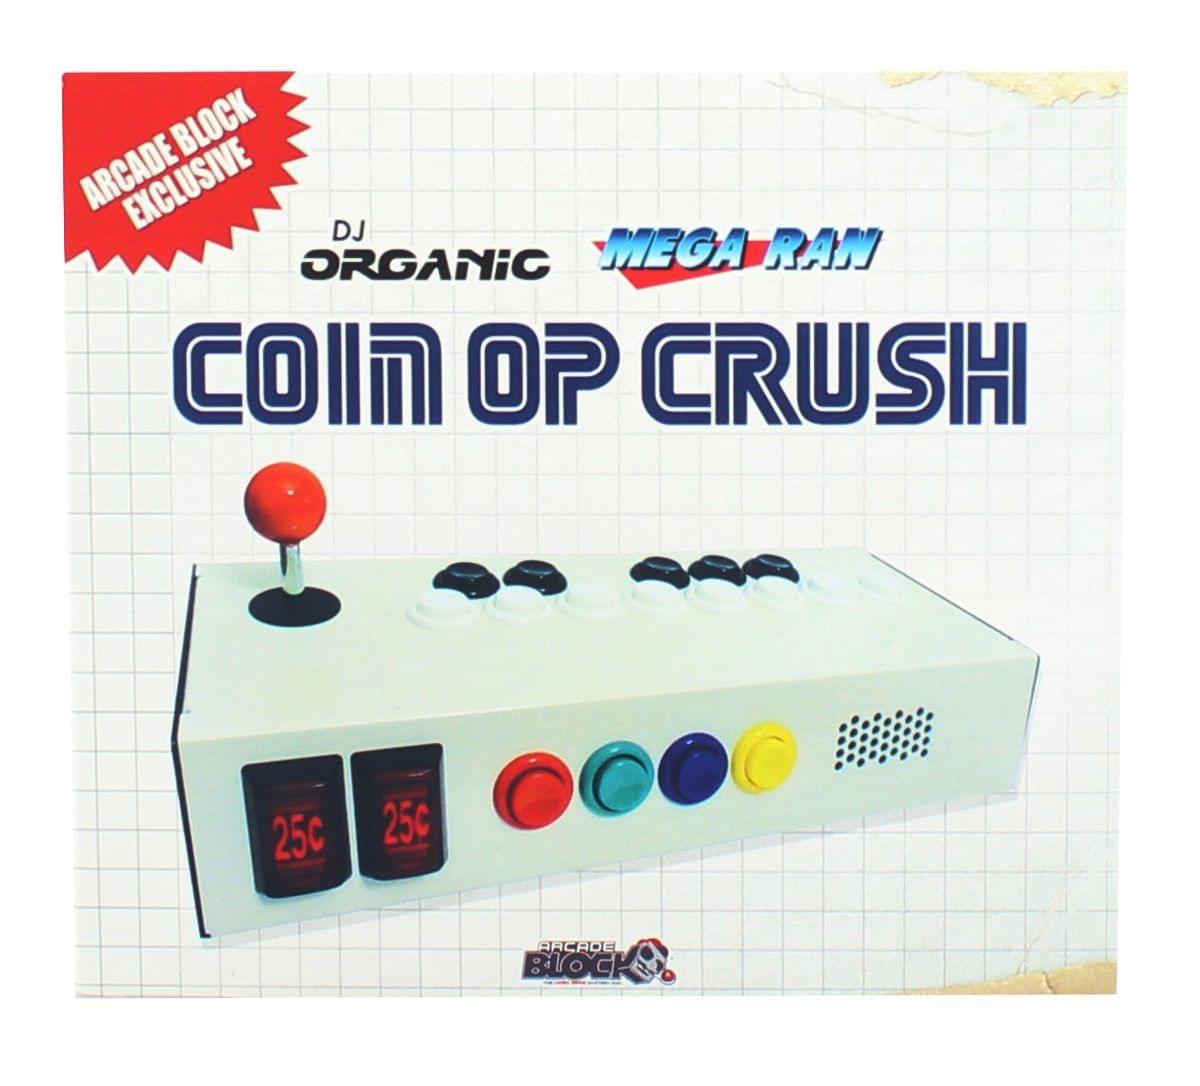 DJ Organic Mega Ran Coin Op Crush Music CD (Arcade Block Exclusive)